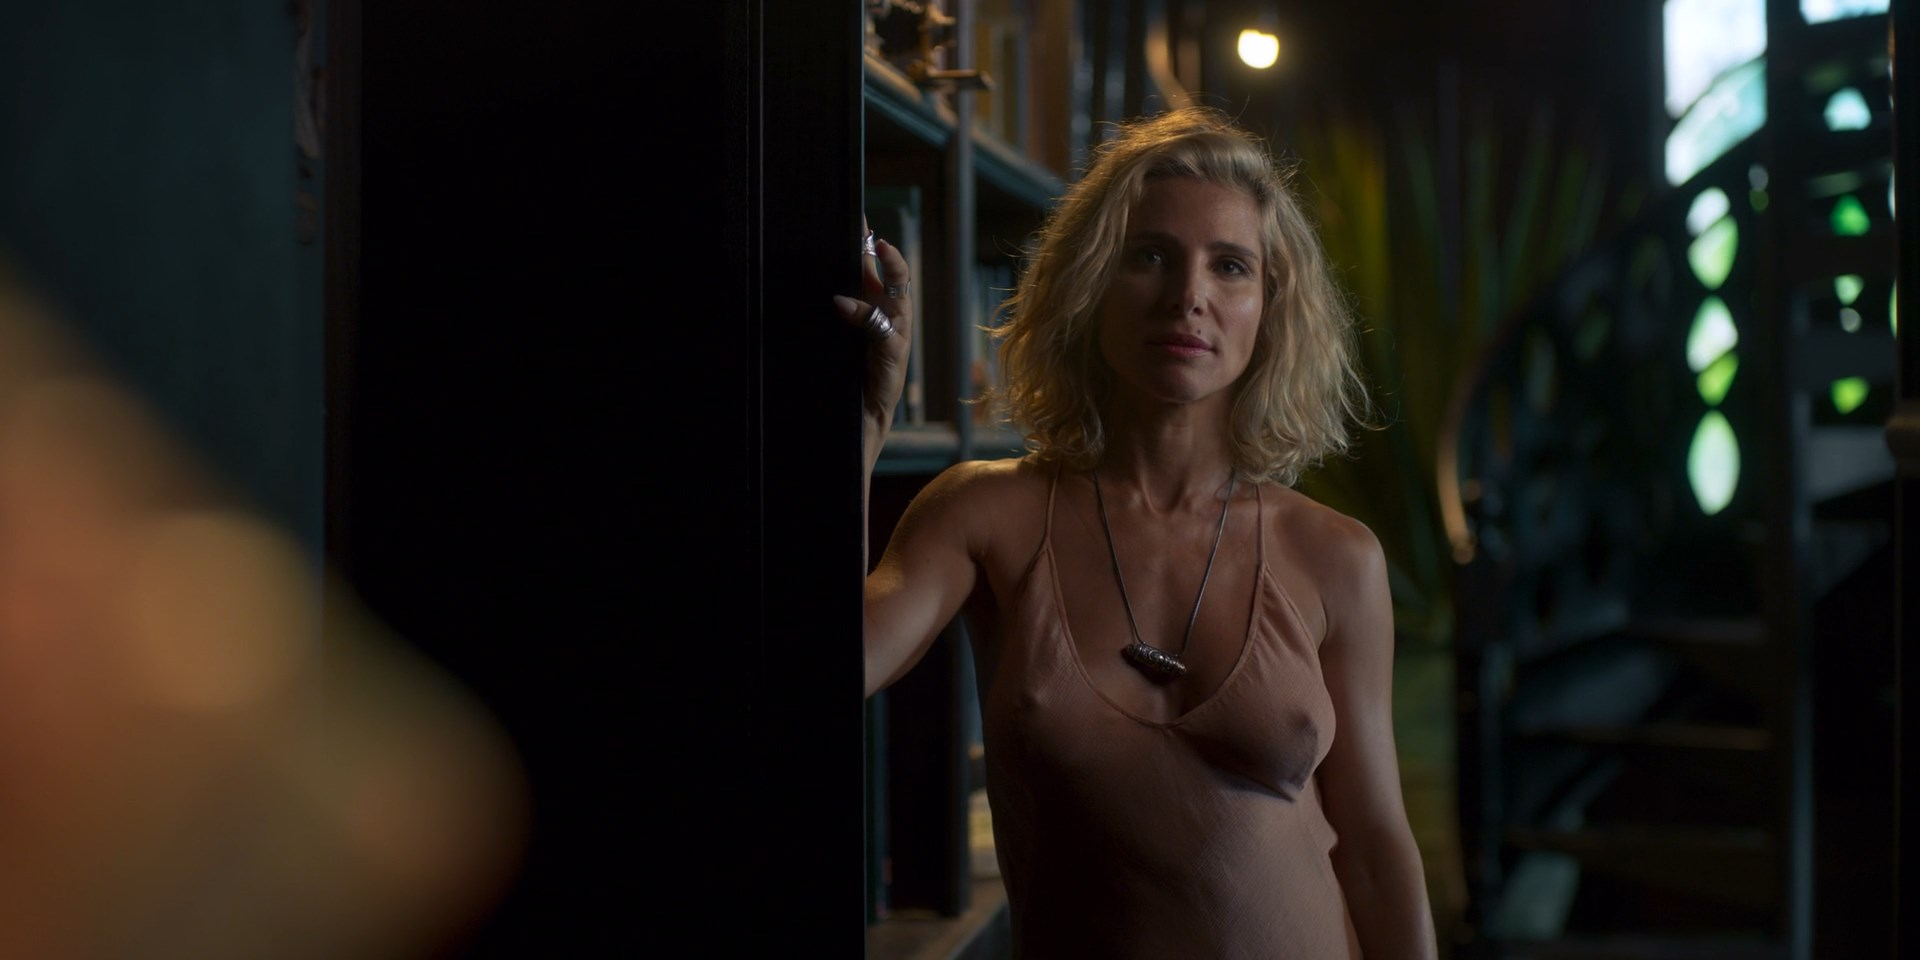 Tv Nudity Page 34 Nudecelebvideo Your Box Of Nude Celebrities